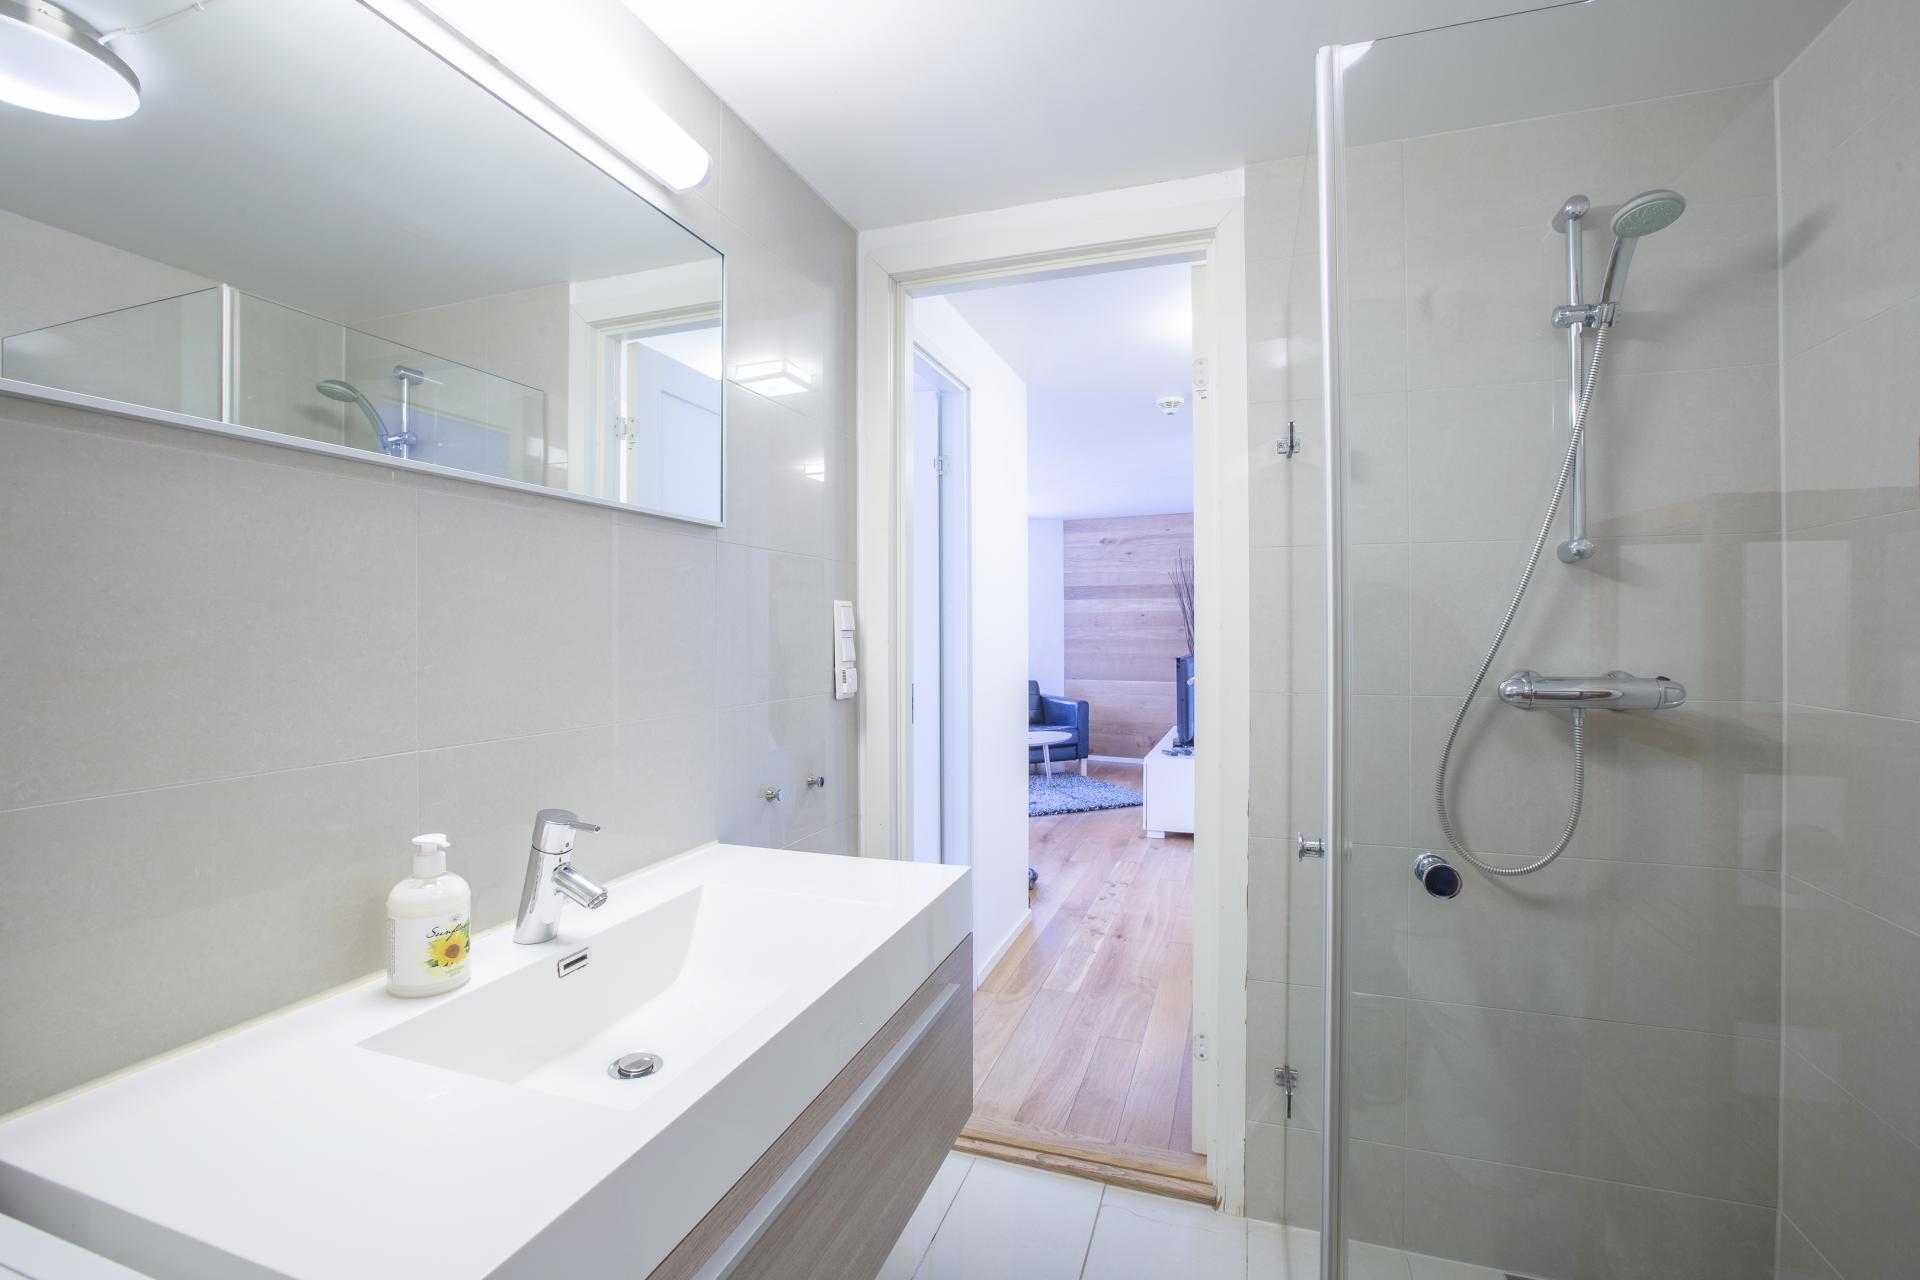 Sink at Saudagata 9 Apartment, Lagard, Stavanger